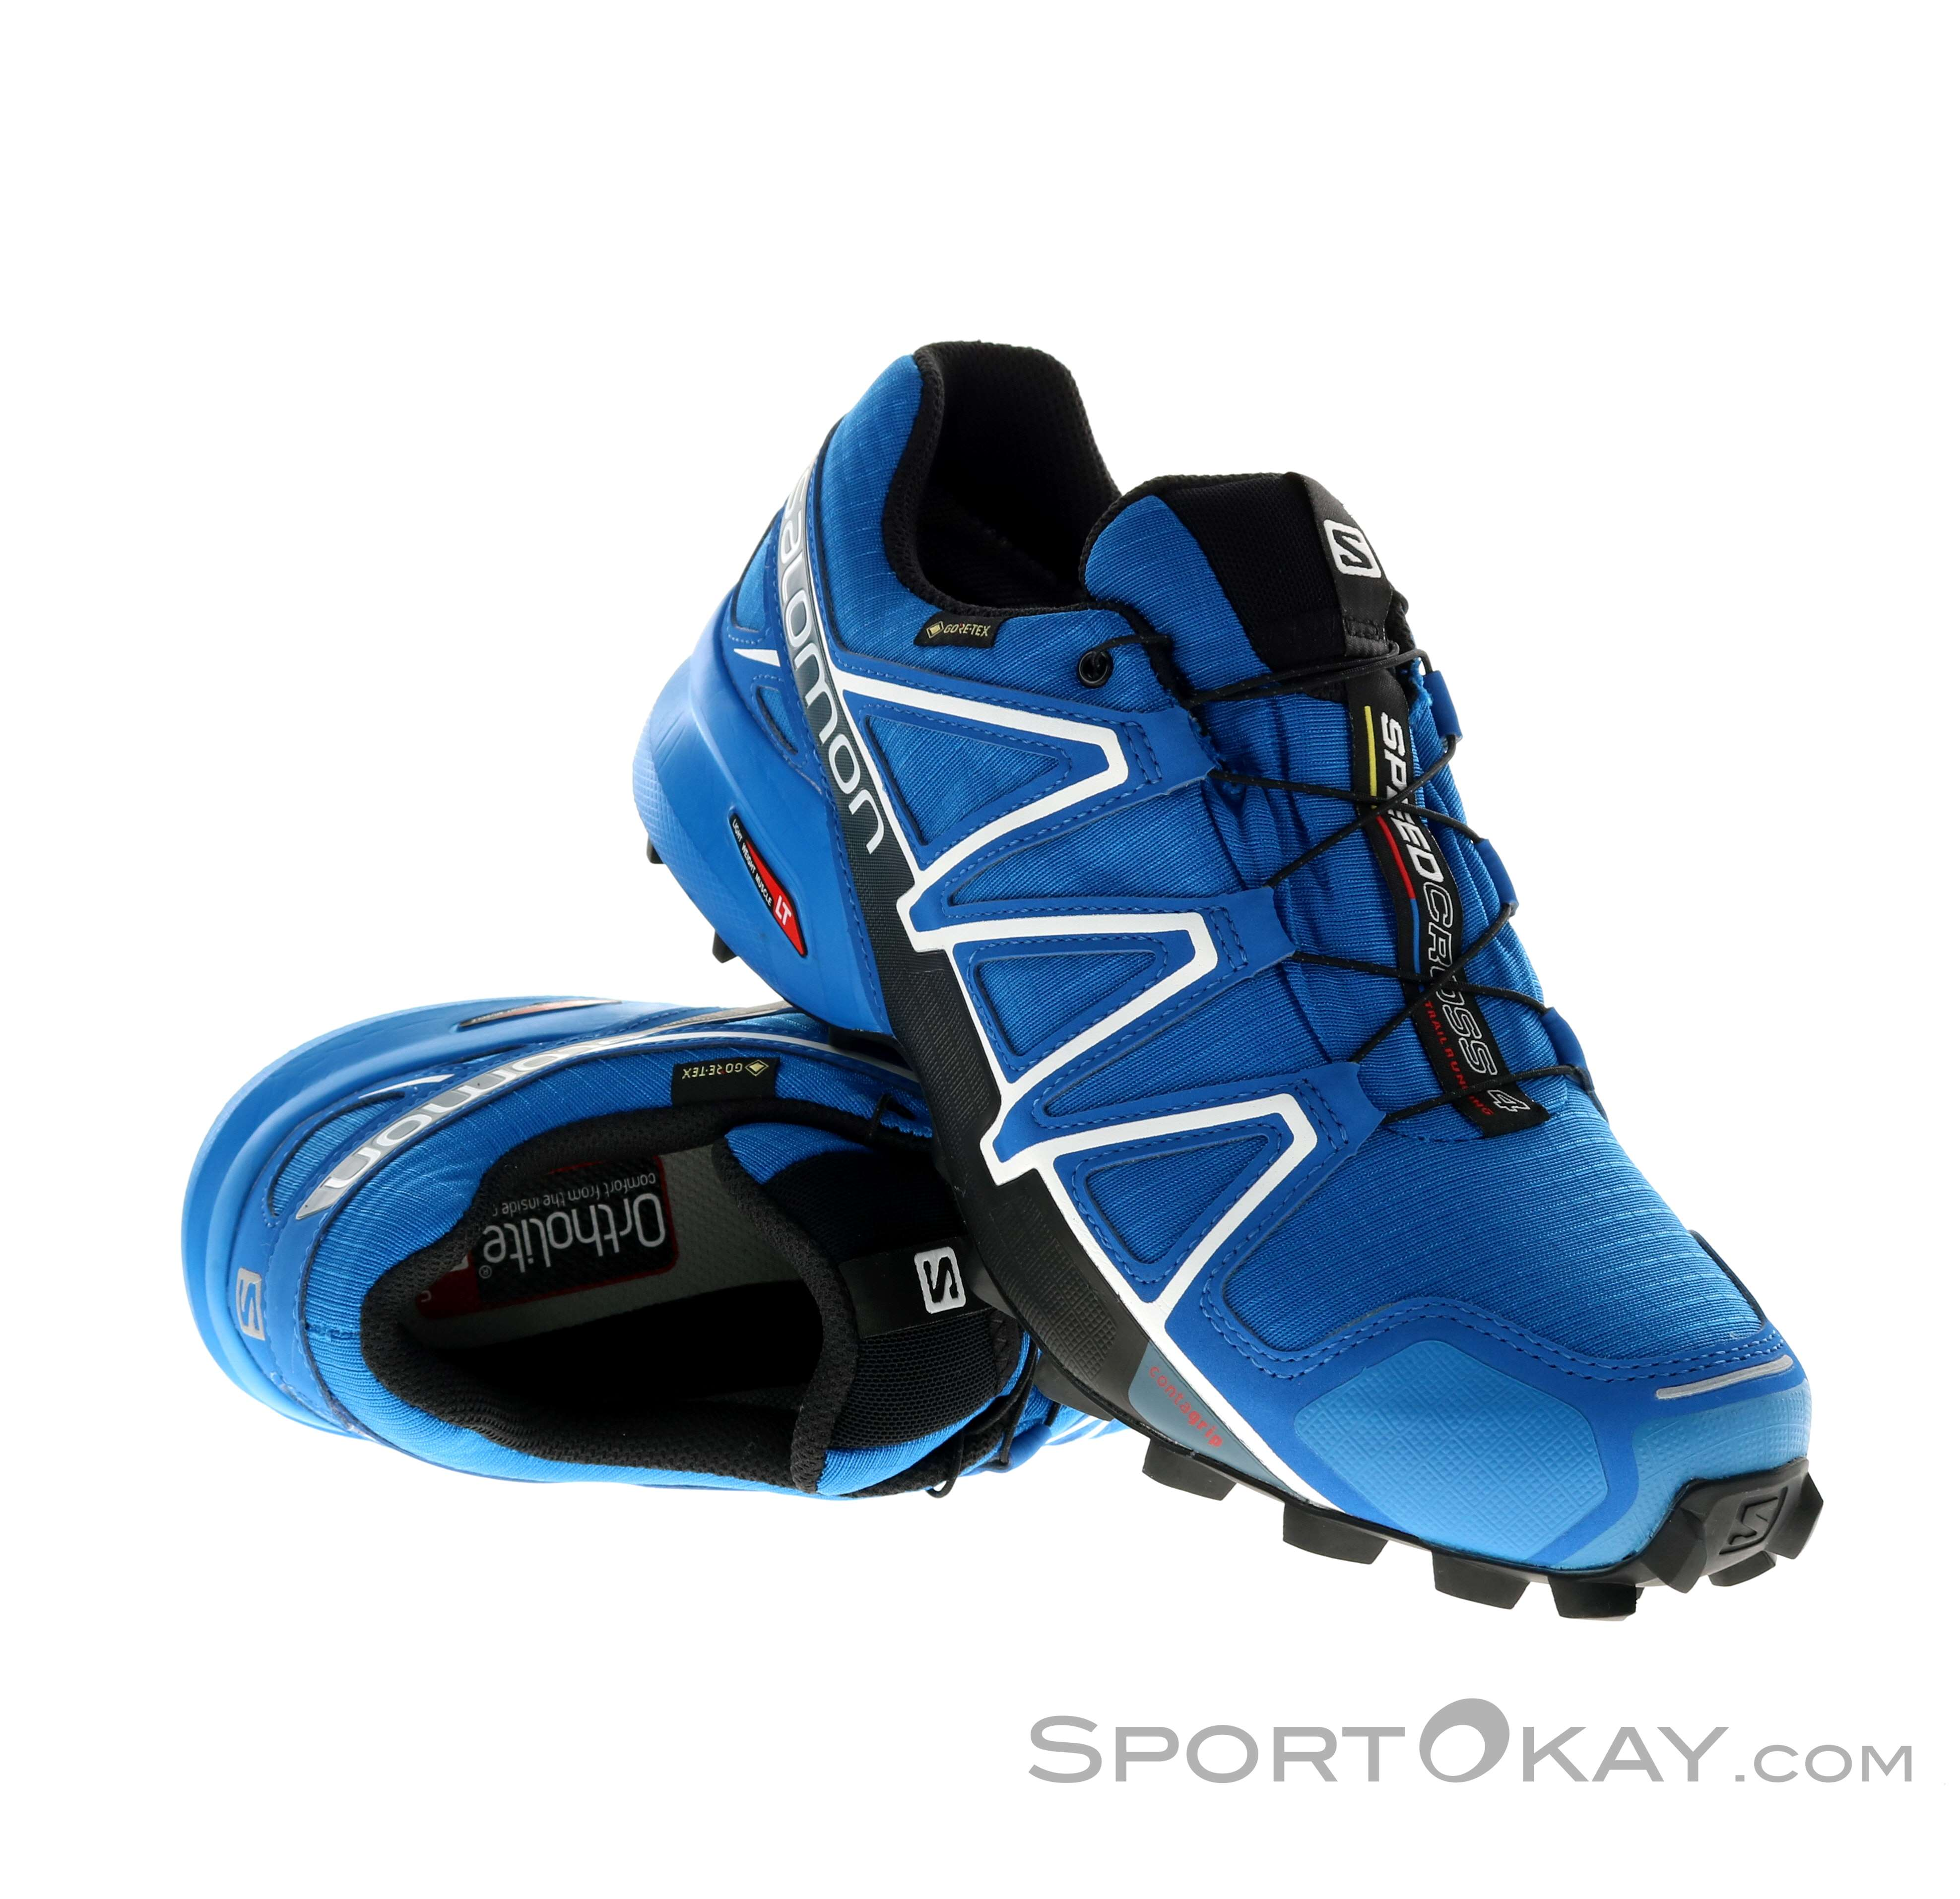 Salomon Salomon Speedcross 4 GTX Mens Trail Running Shoes Gore Tex